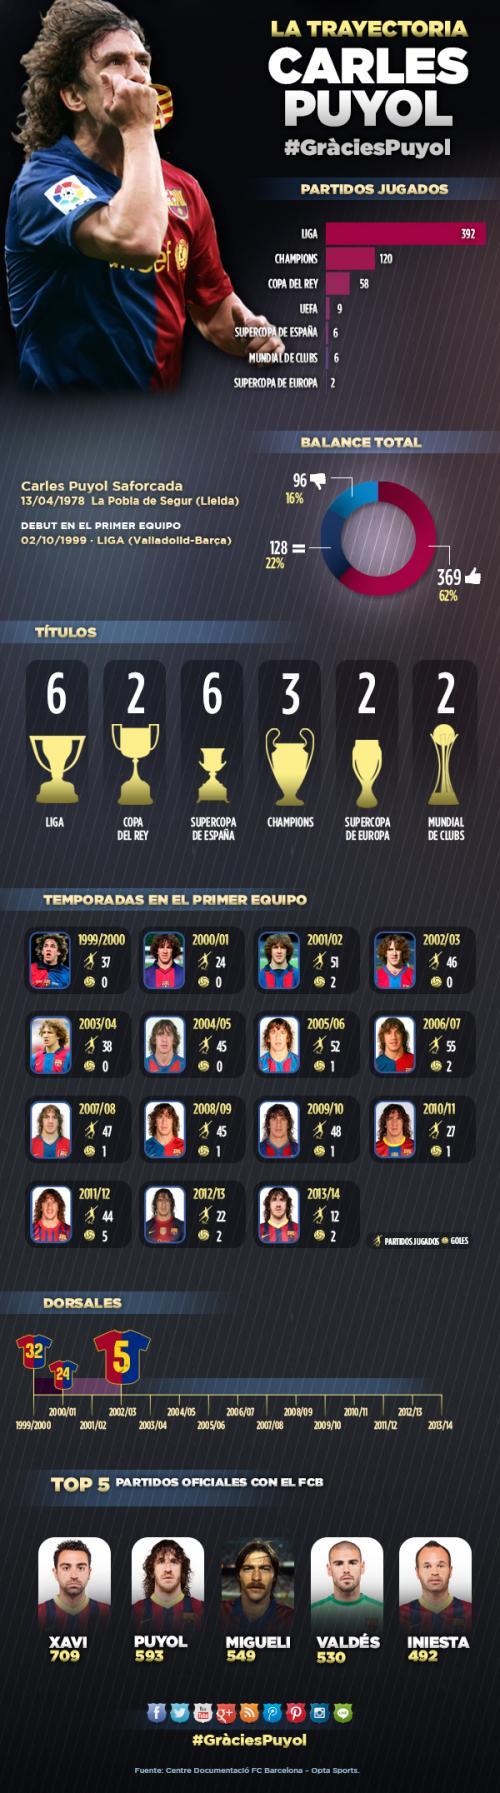 (Infografía: fcbarcelona.com)